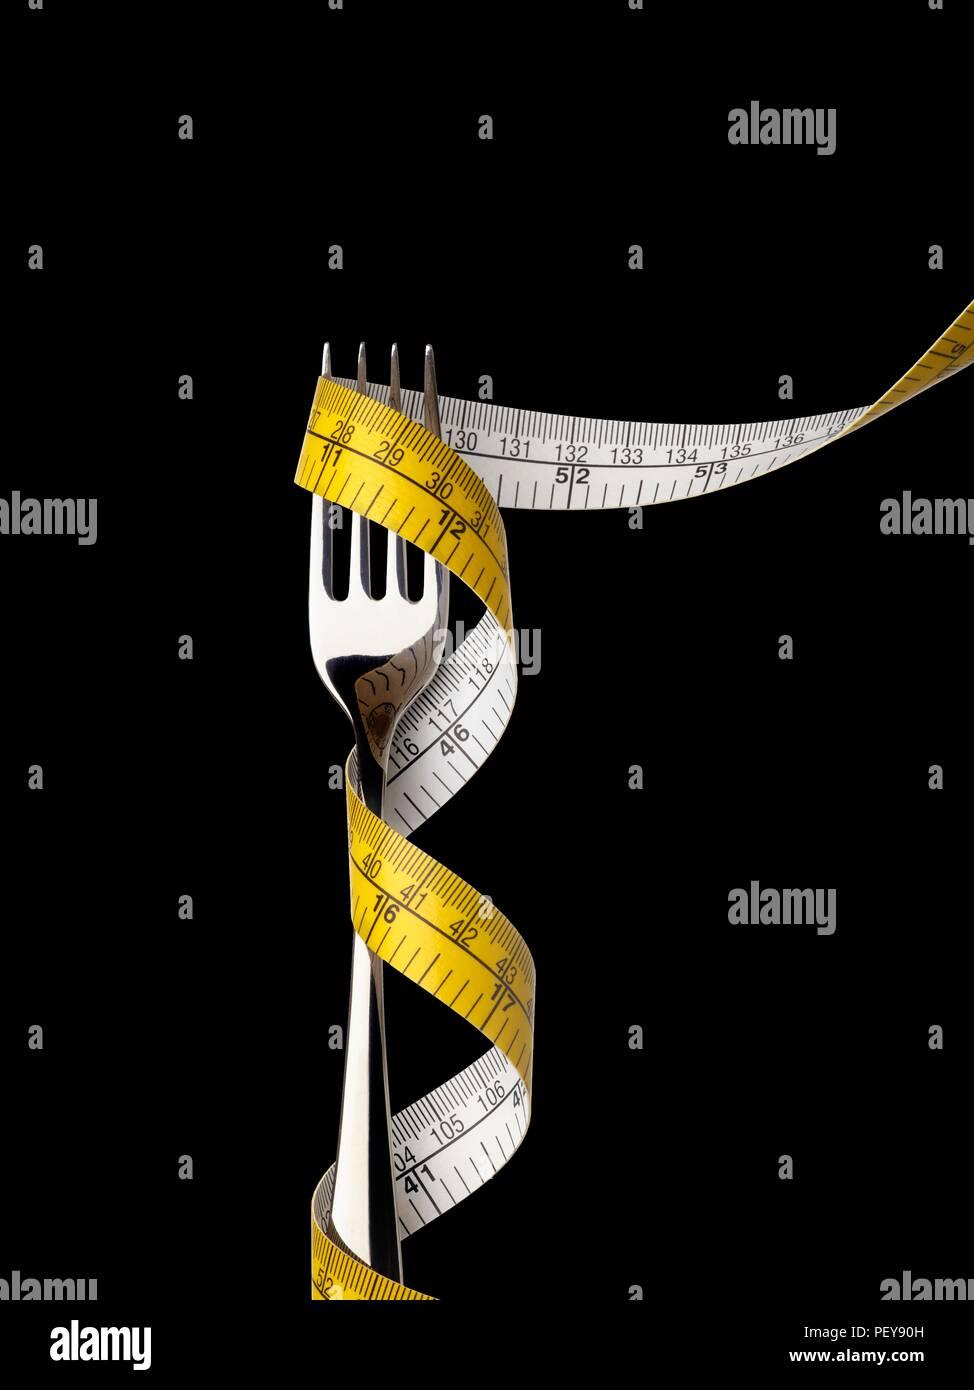 Horquilla con cinta métrica. Imagen De Stock